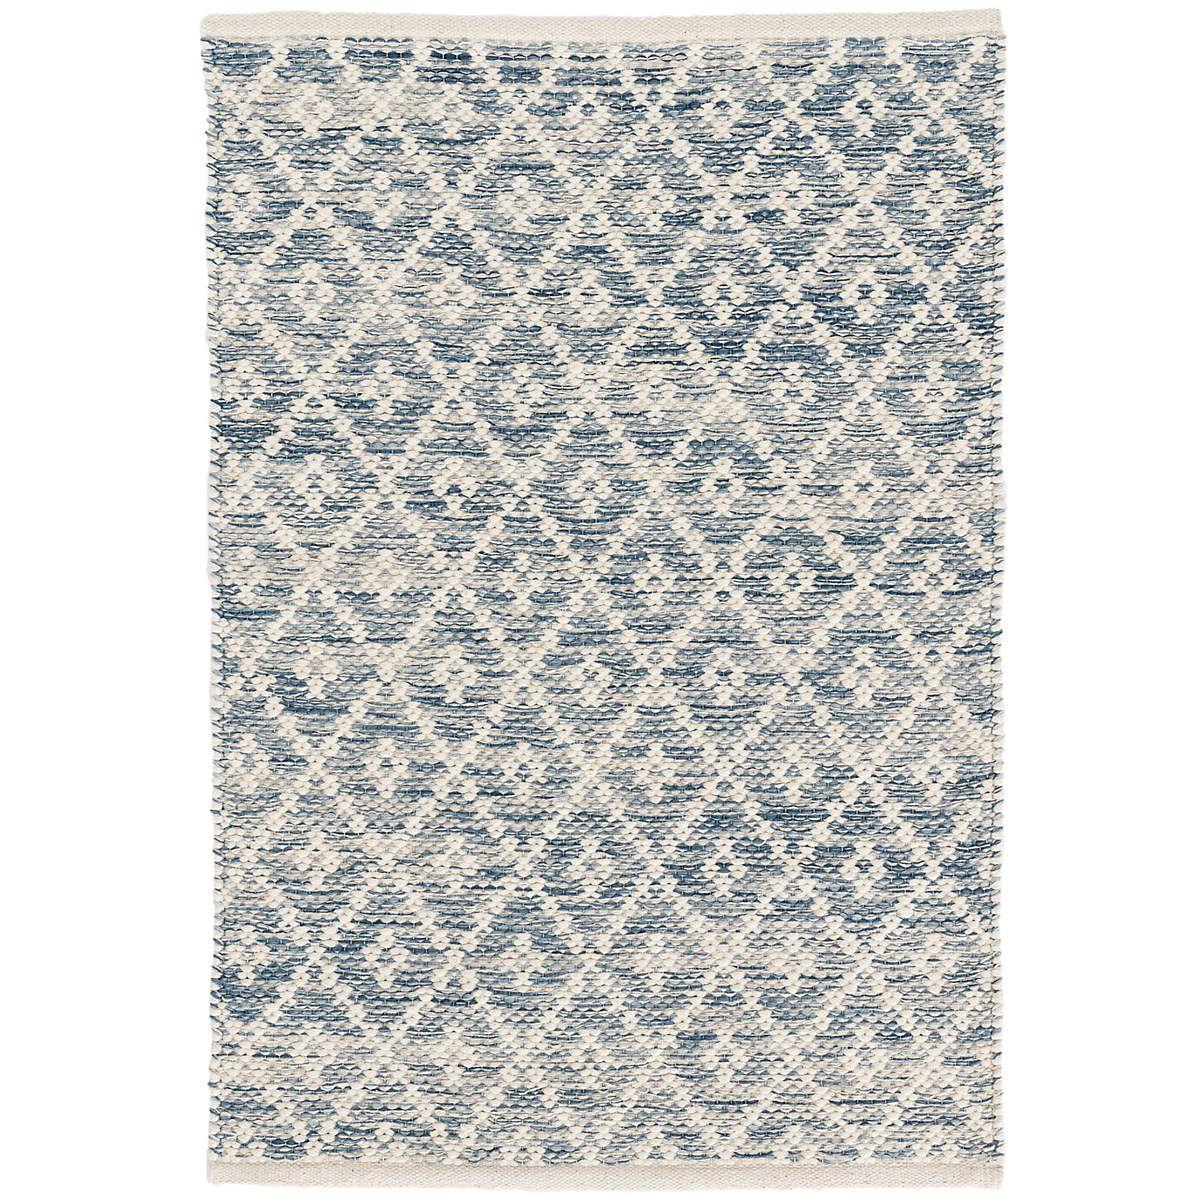 Melange Diamond Blue Woven Cotton Rug Dash Albert In 2020 Cotton Rug Washable Area Rugs Dash And Albert